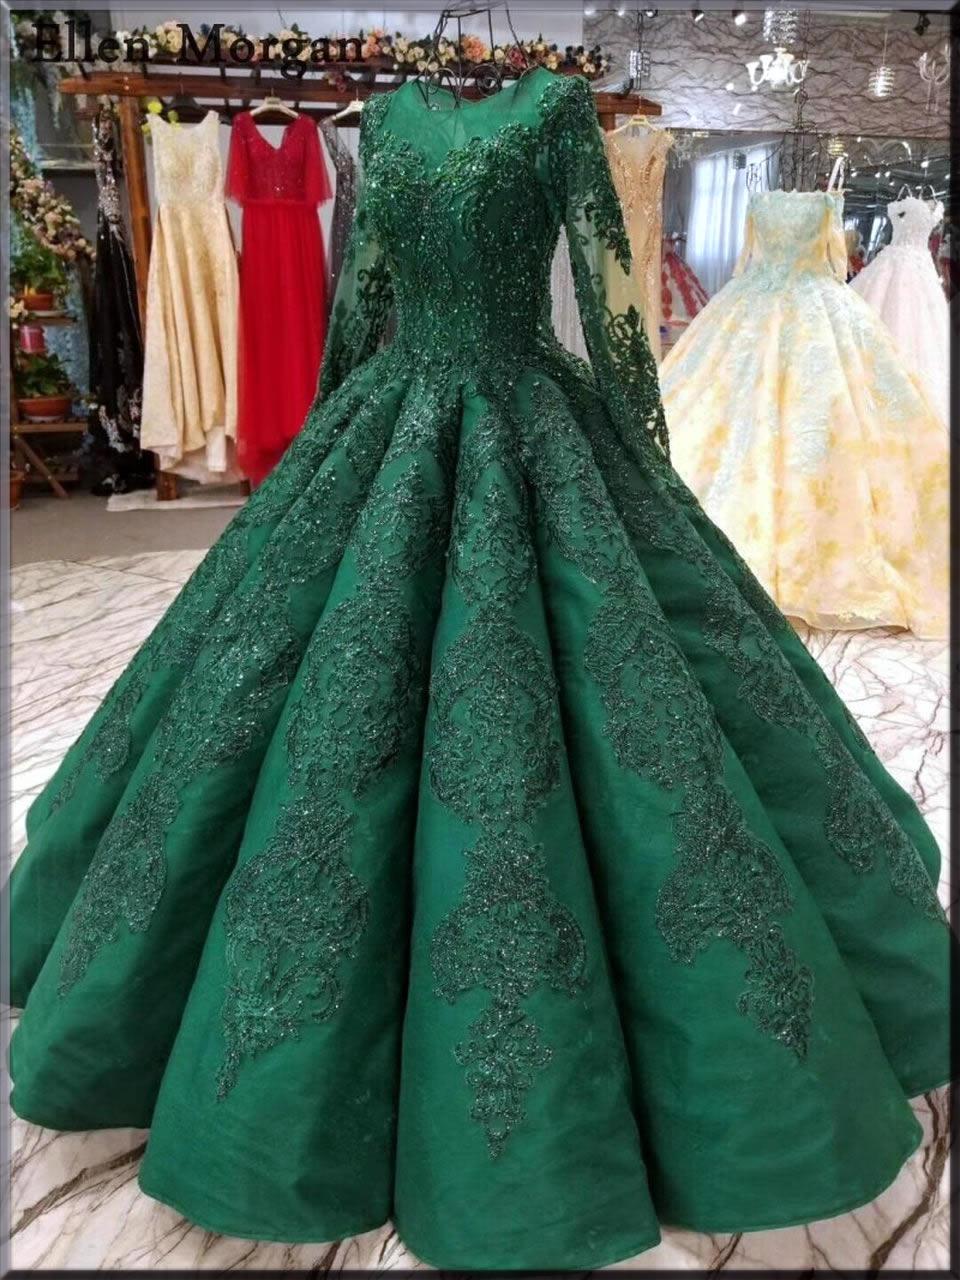 green arabian dress for Valentine's Day